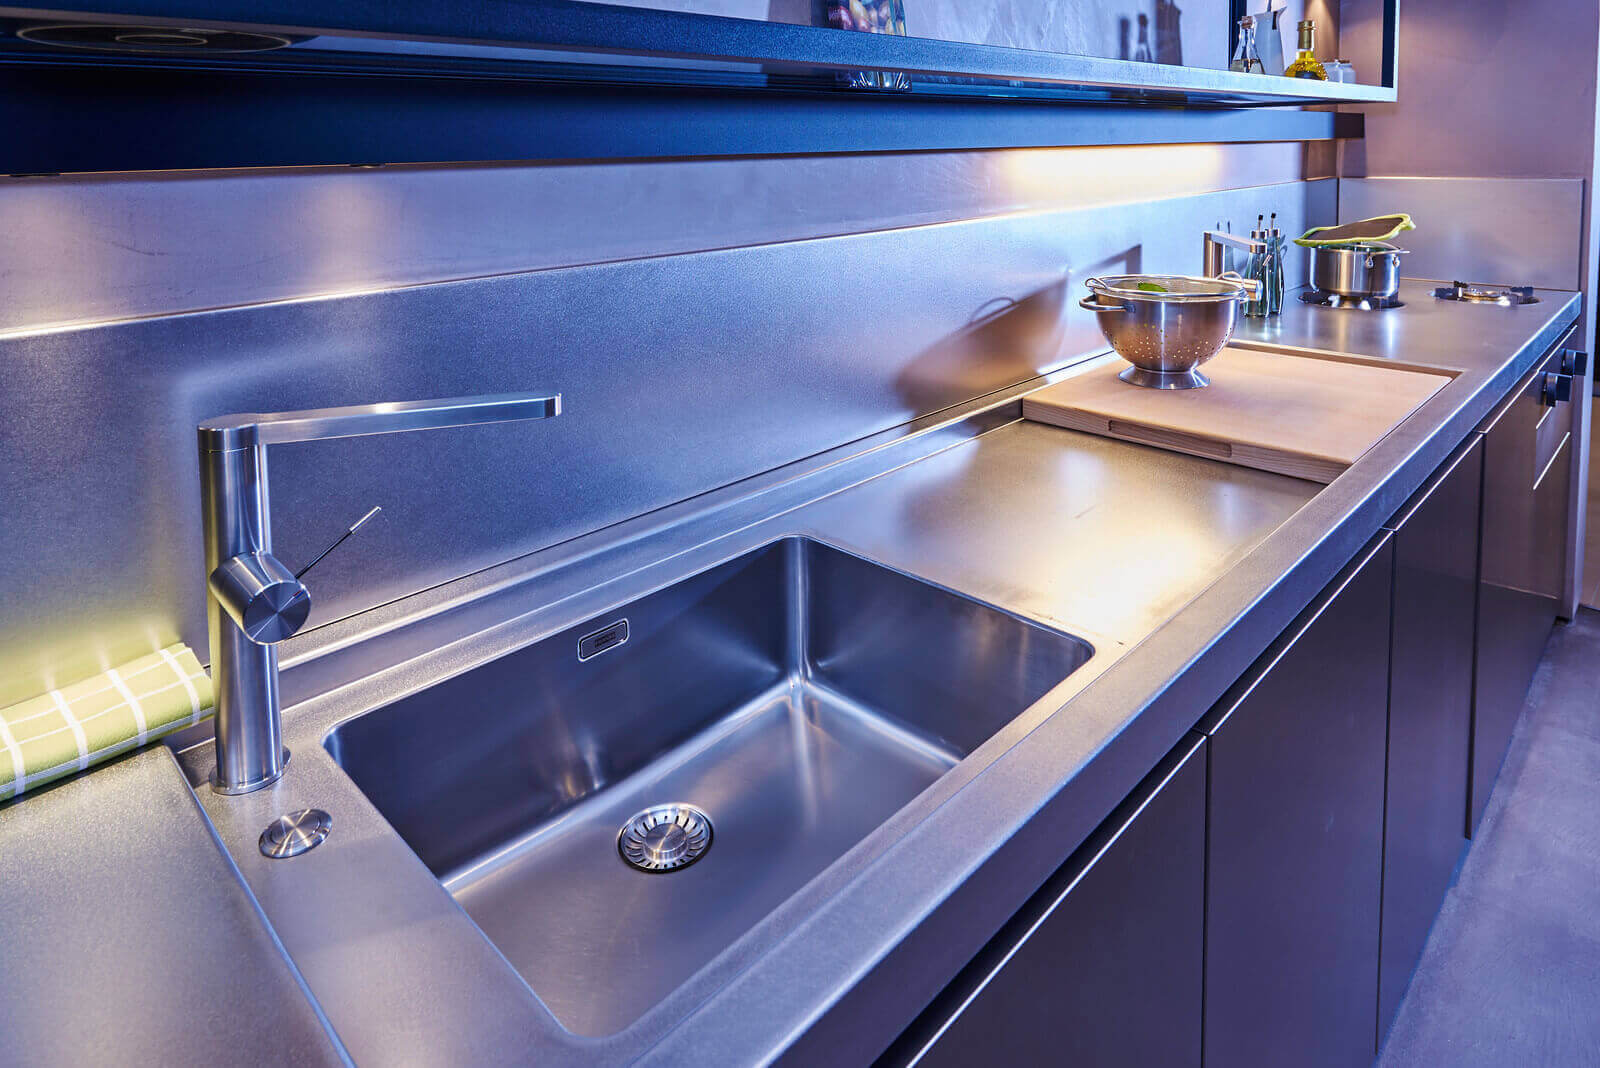 RVS keuken van Tieleman Keukens